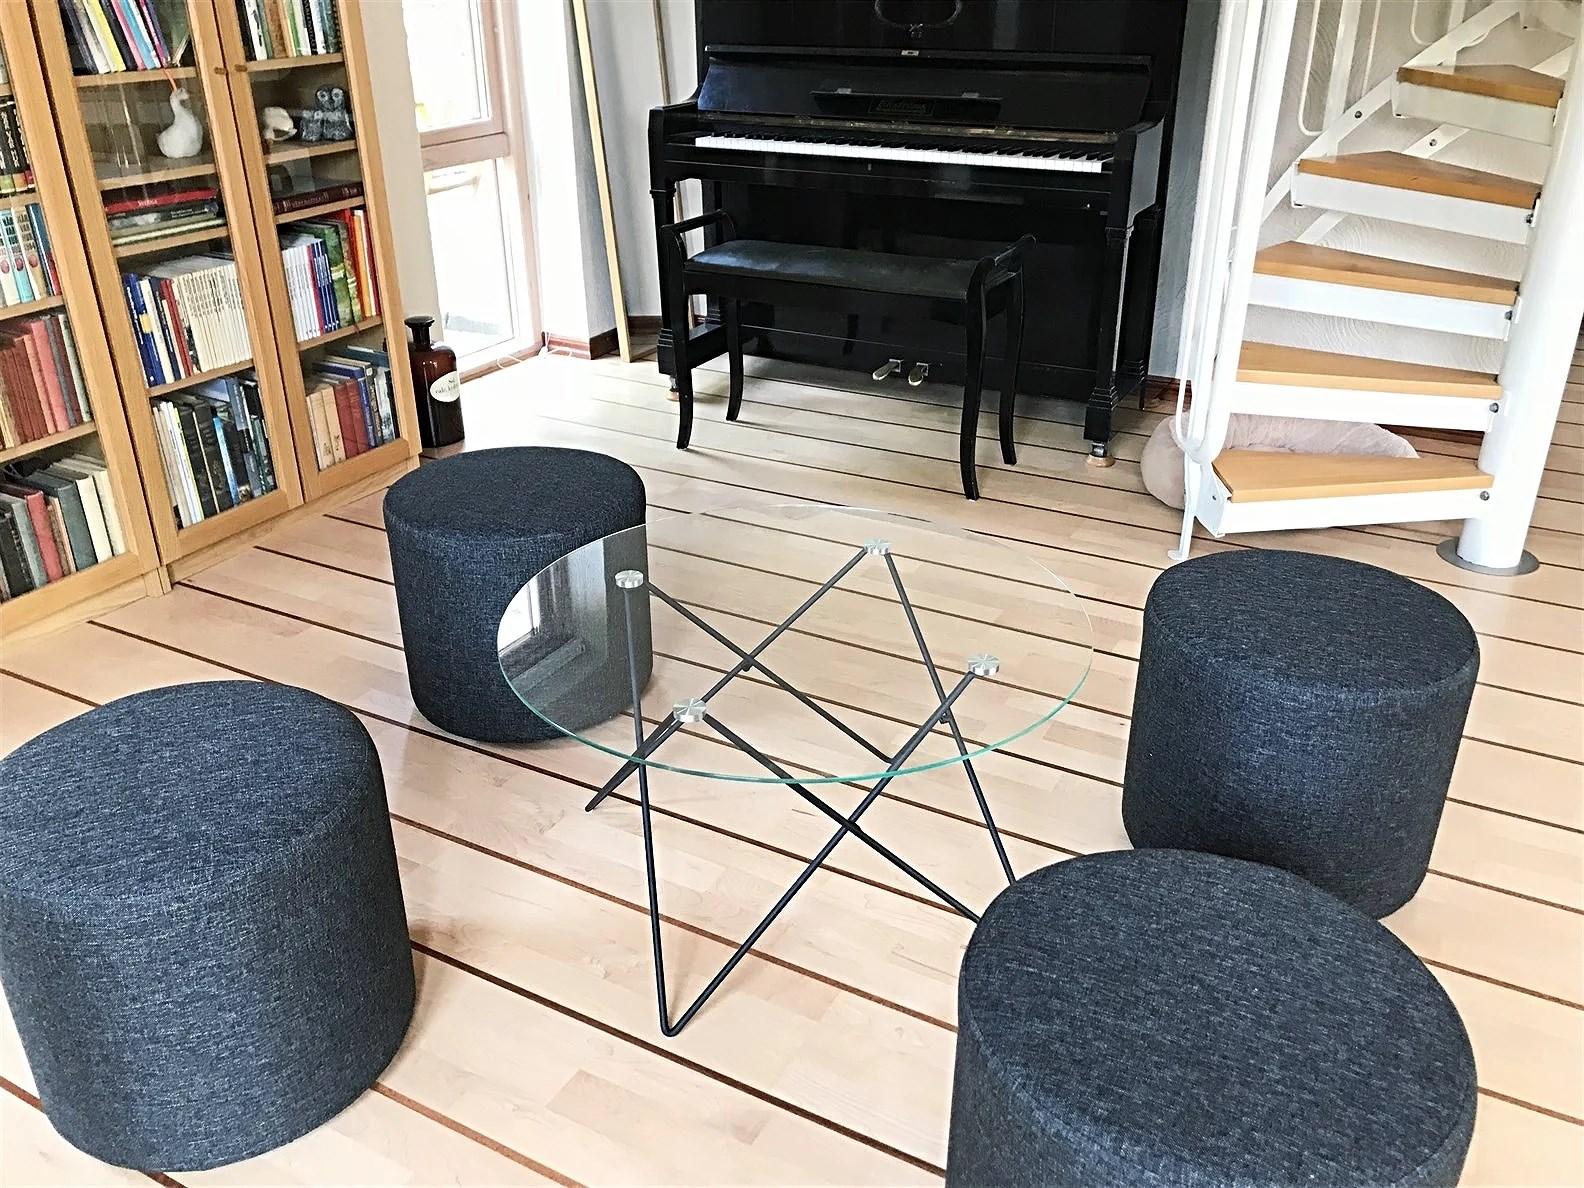 Vardagsrummet - Efter